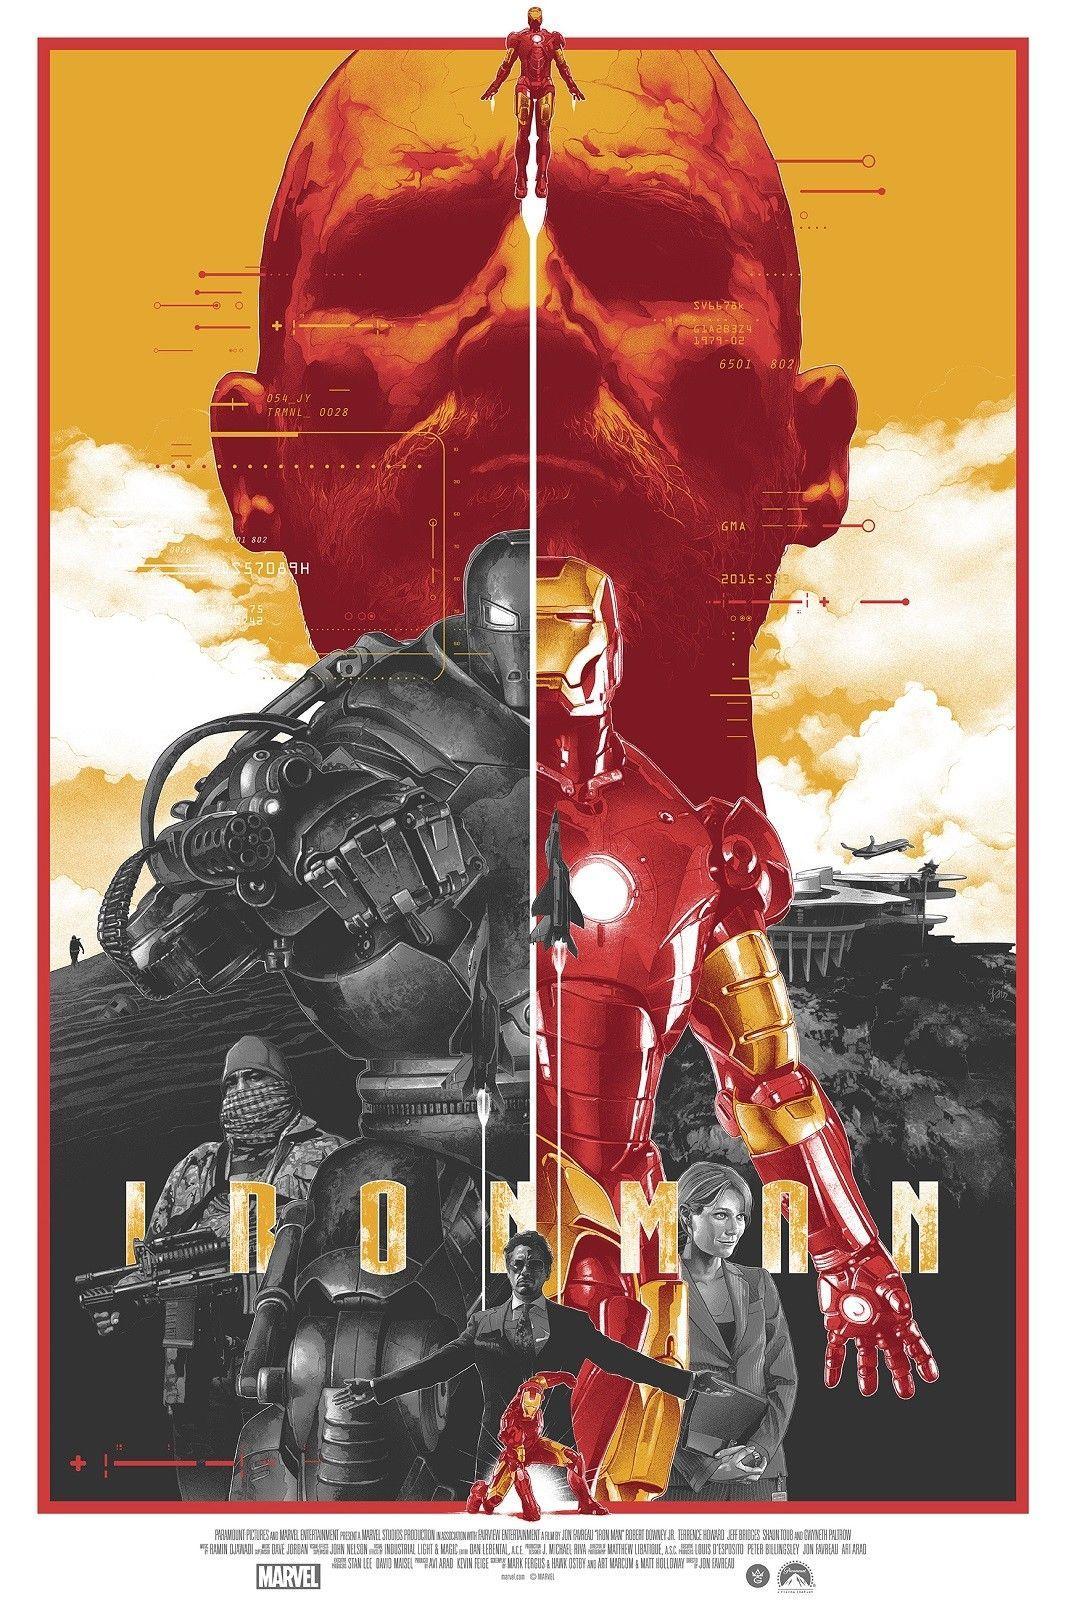 47d7ea07d1ce 2019 Iron Man Marvel Avengers Art Silk Print Poster 24x36inch60x90cm 018  From Chuy8988